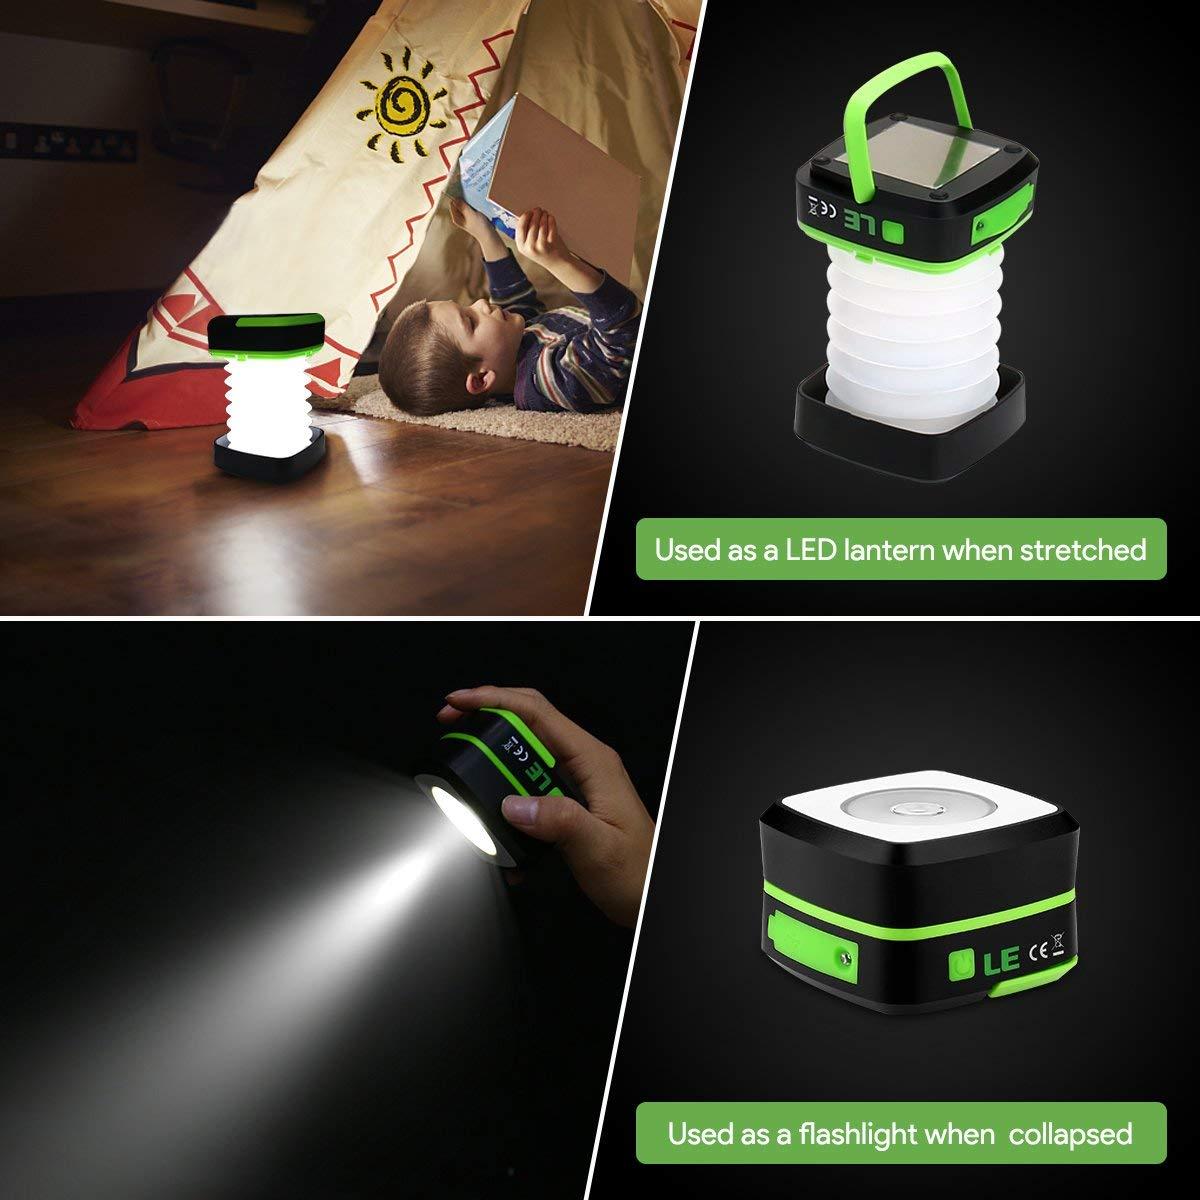 LE L/ámpara Camping LED USB Recargable Farol Camping 3 Modos 120lm IPX4 Impermeable Pesca Luz Camping Plegable para Carpa Emergencia y M/ás